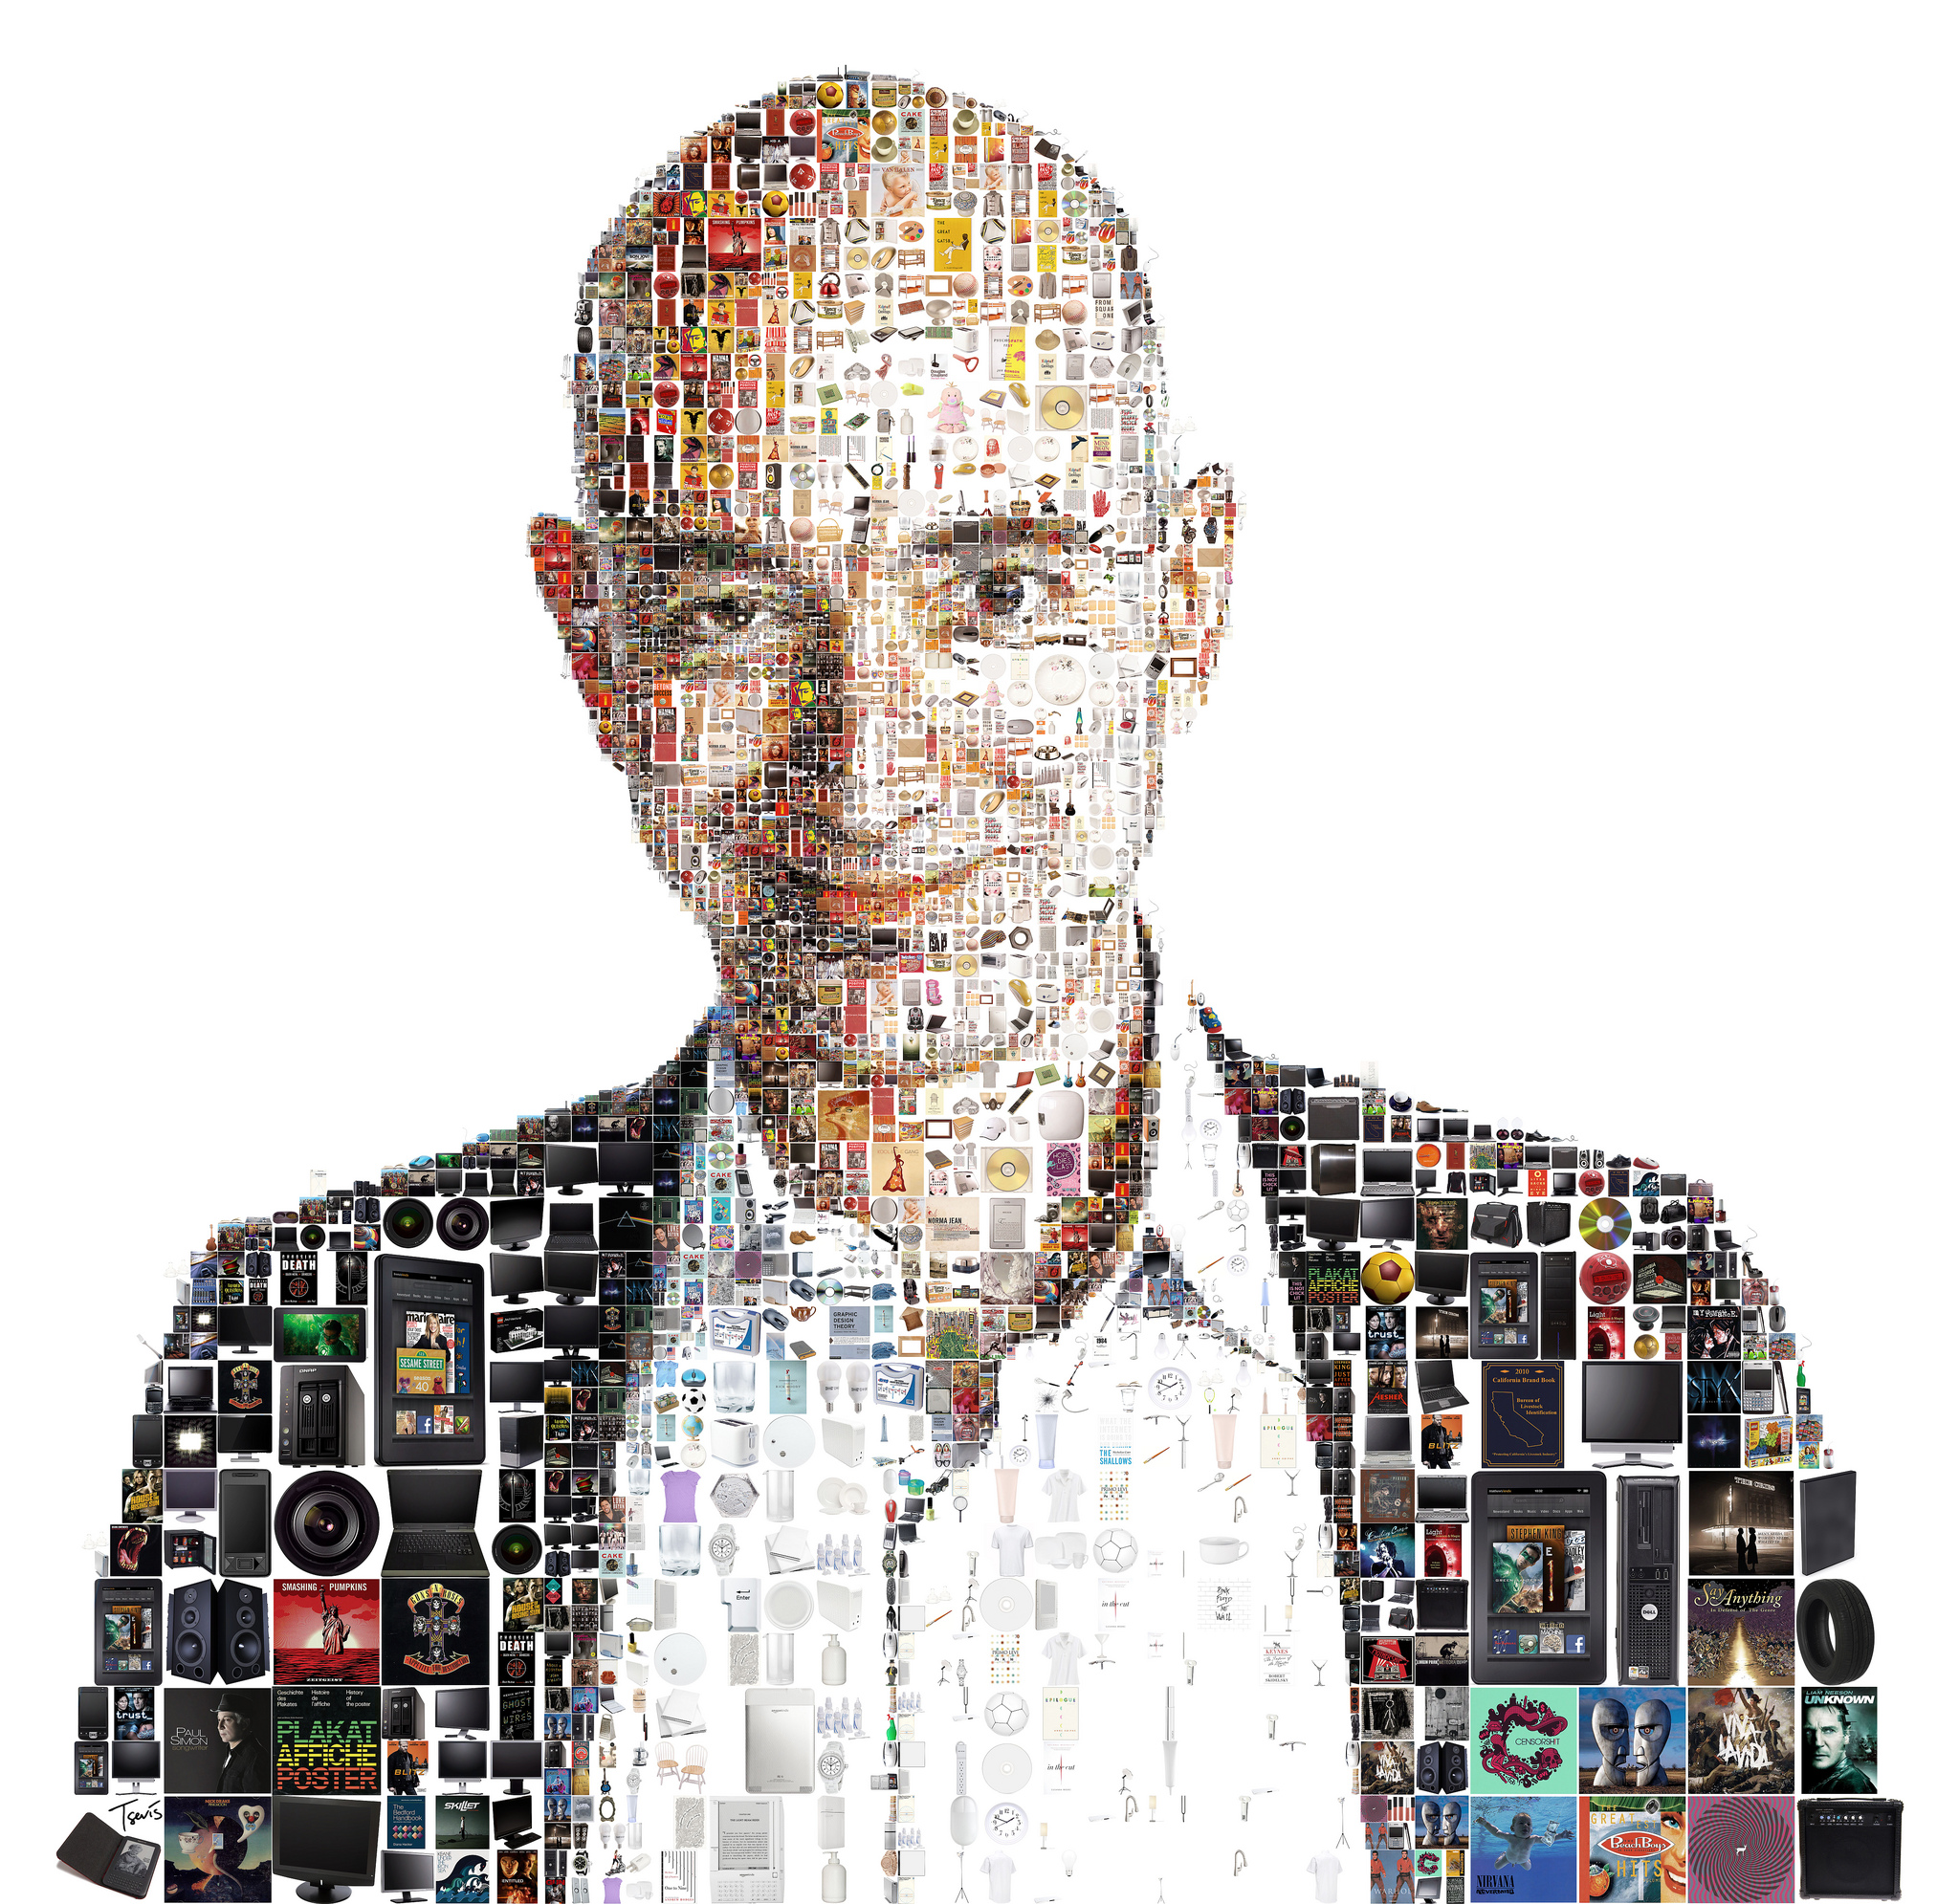 Jeff-Bezos-Gifts-$1-Million-To-RCFP